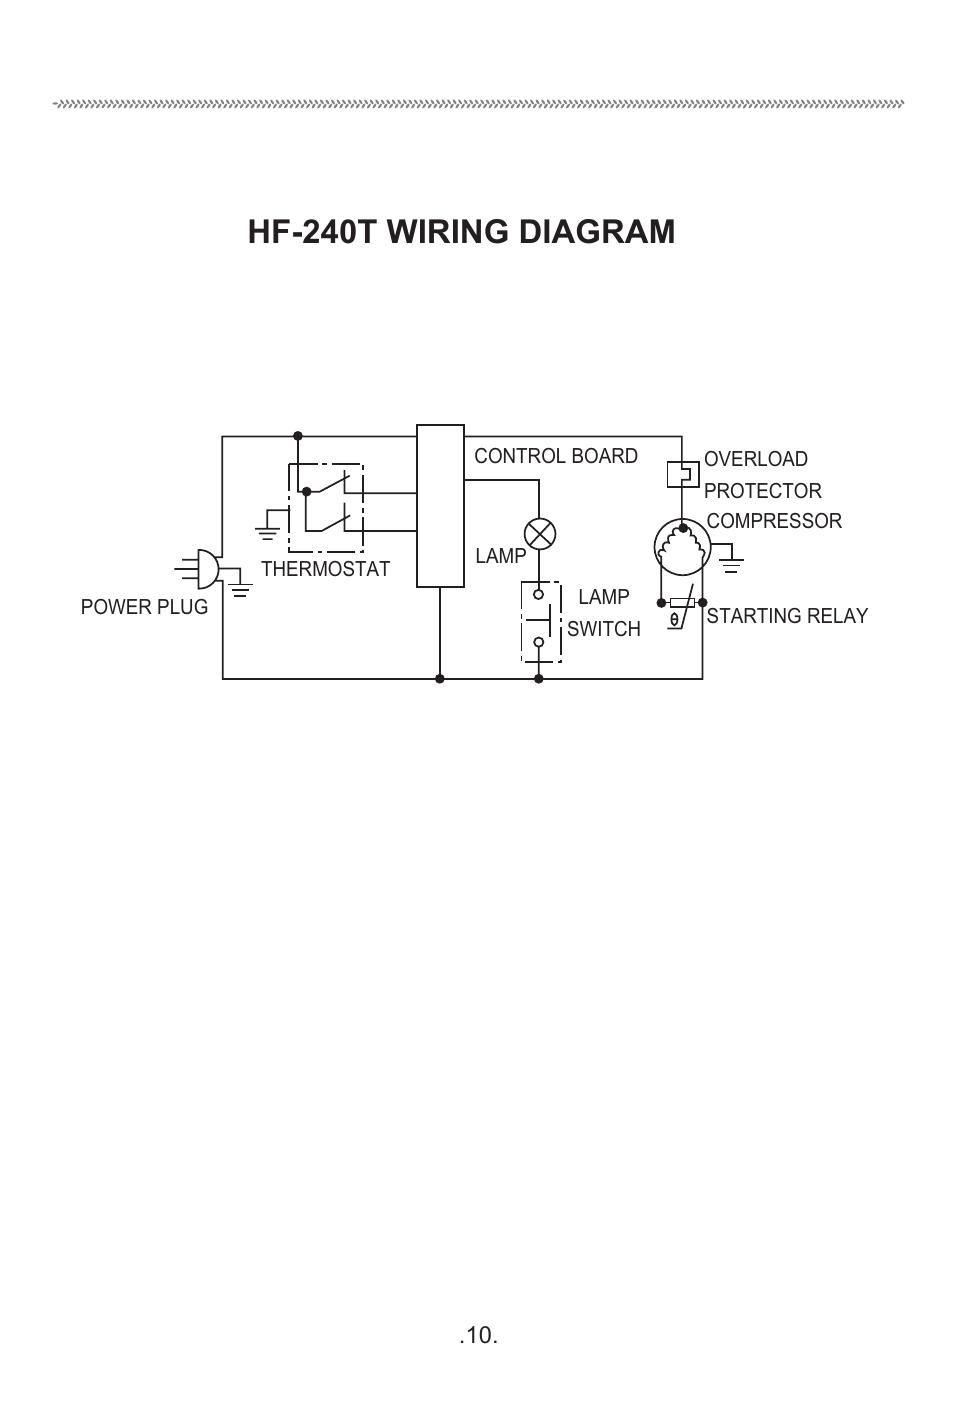 Hf-240t wiring diagram | haier HF-240T User Manual | Page 17 / 19 on estate wiring diagram, roper wiring diagram, sears wiring diagram, crosley wiring diagram, broan wiring diagram, o2 wiring diagram, benq wiring diagram, midea wiring diagram, braun wiring diagram, panasonic wiring diagram, apple wiring diagram, apc wiring diagram, dcs wiring diagram, viking wiring diagram, danby wiring diagram, msi wiring diagram, toshiba wiring diagram, foscam wiring diagram, vivitar wiring diagram, manufacturing wiring diagram,